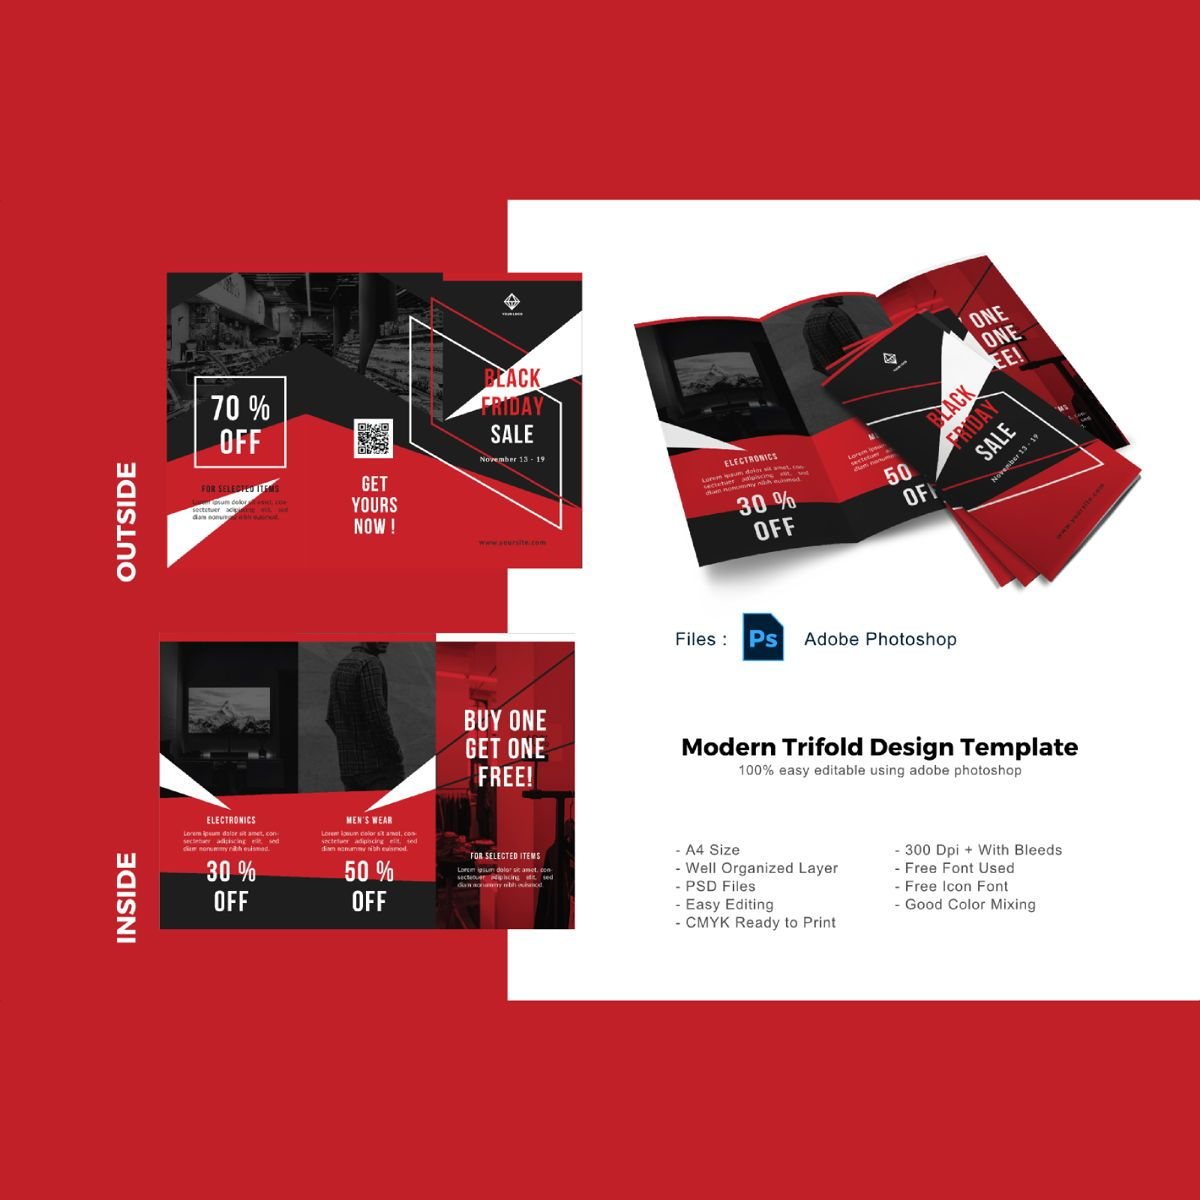 Black friday sale trifold brochure template, 08902, Business — PoweredTemplate.com